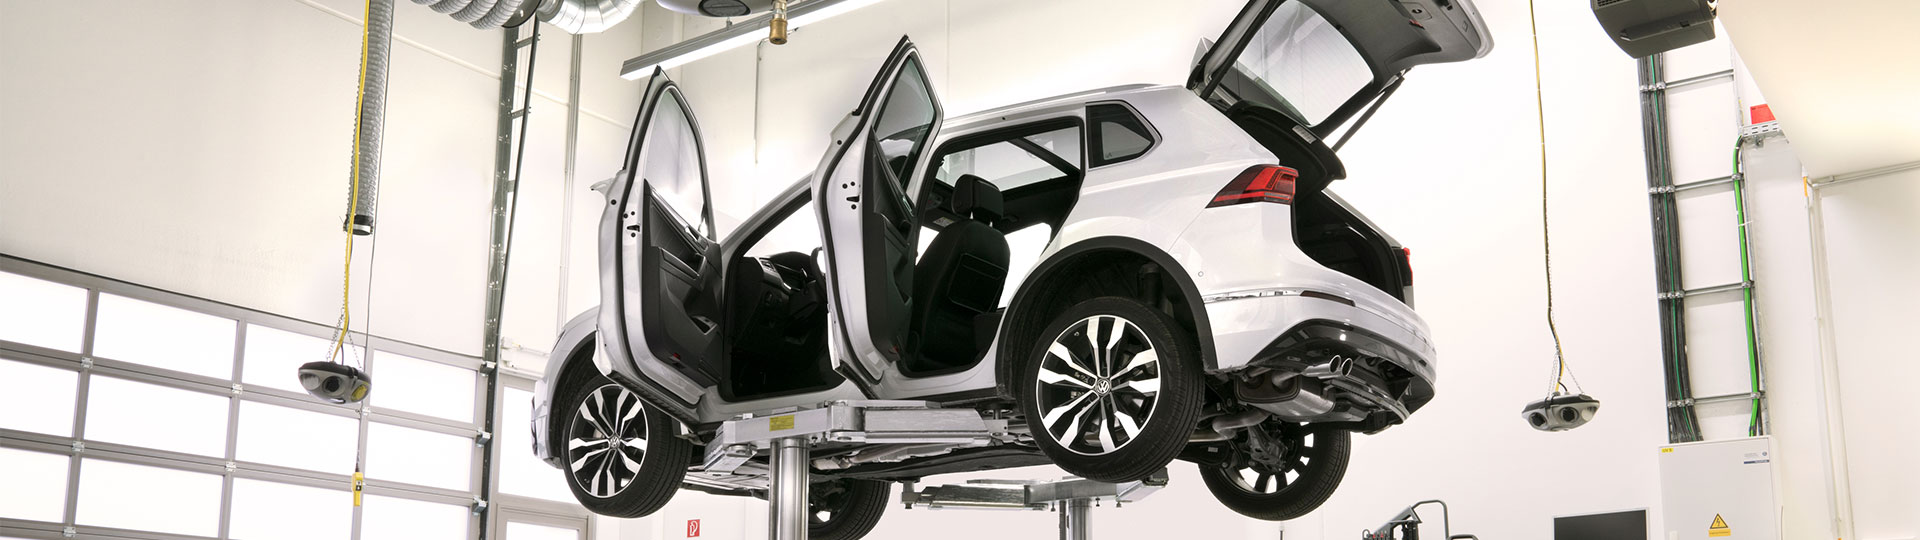 Volkswagen Tiguan på verkstan